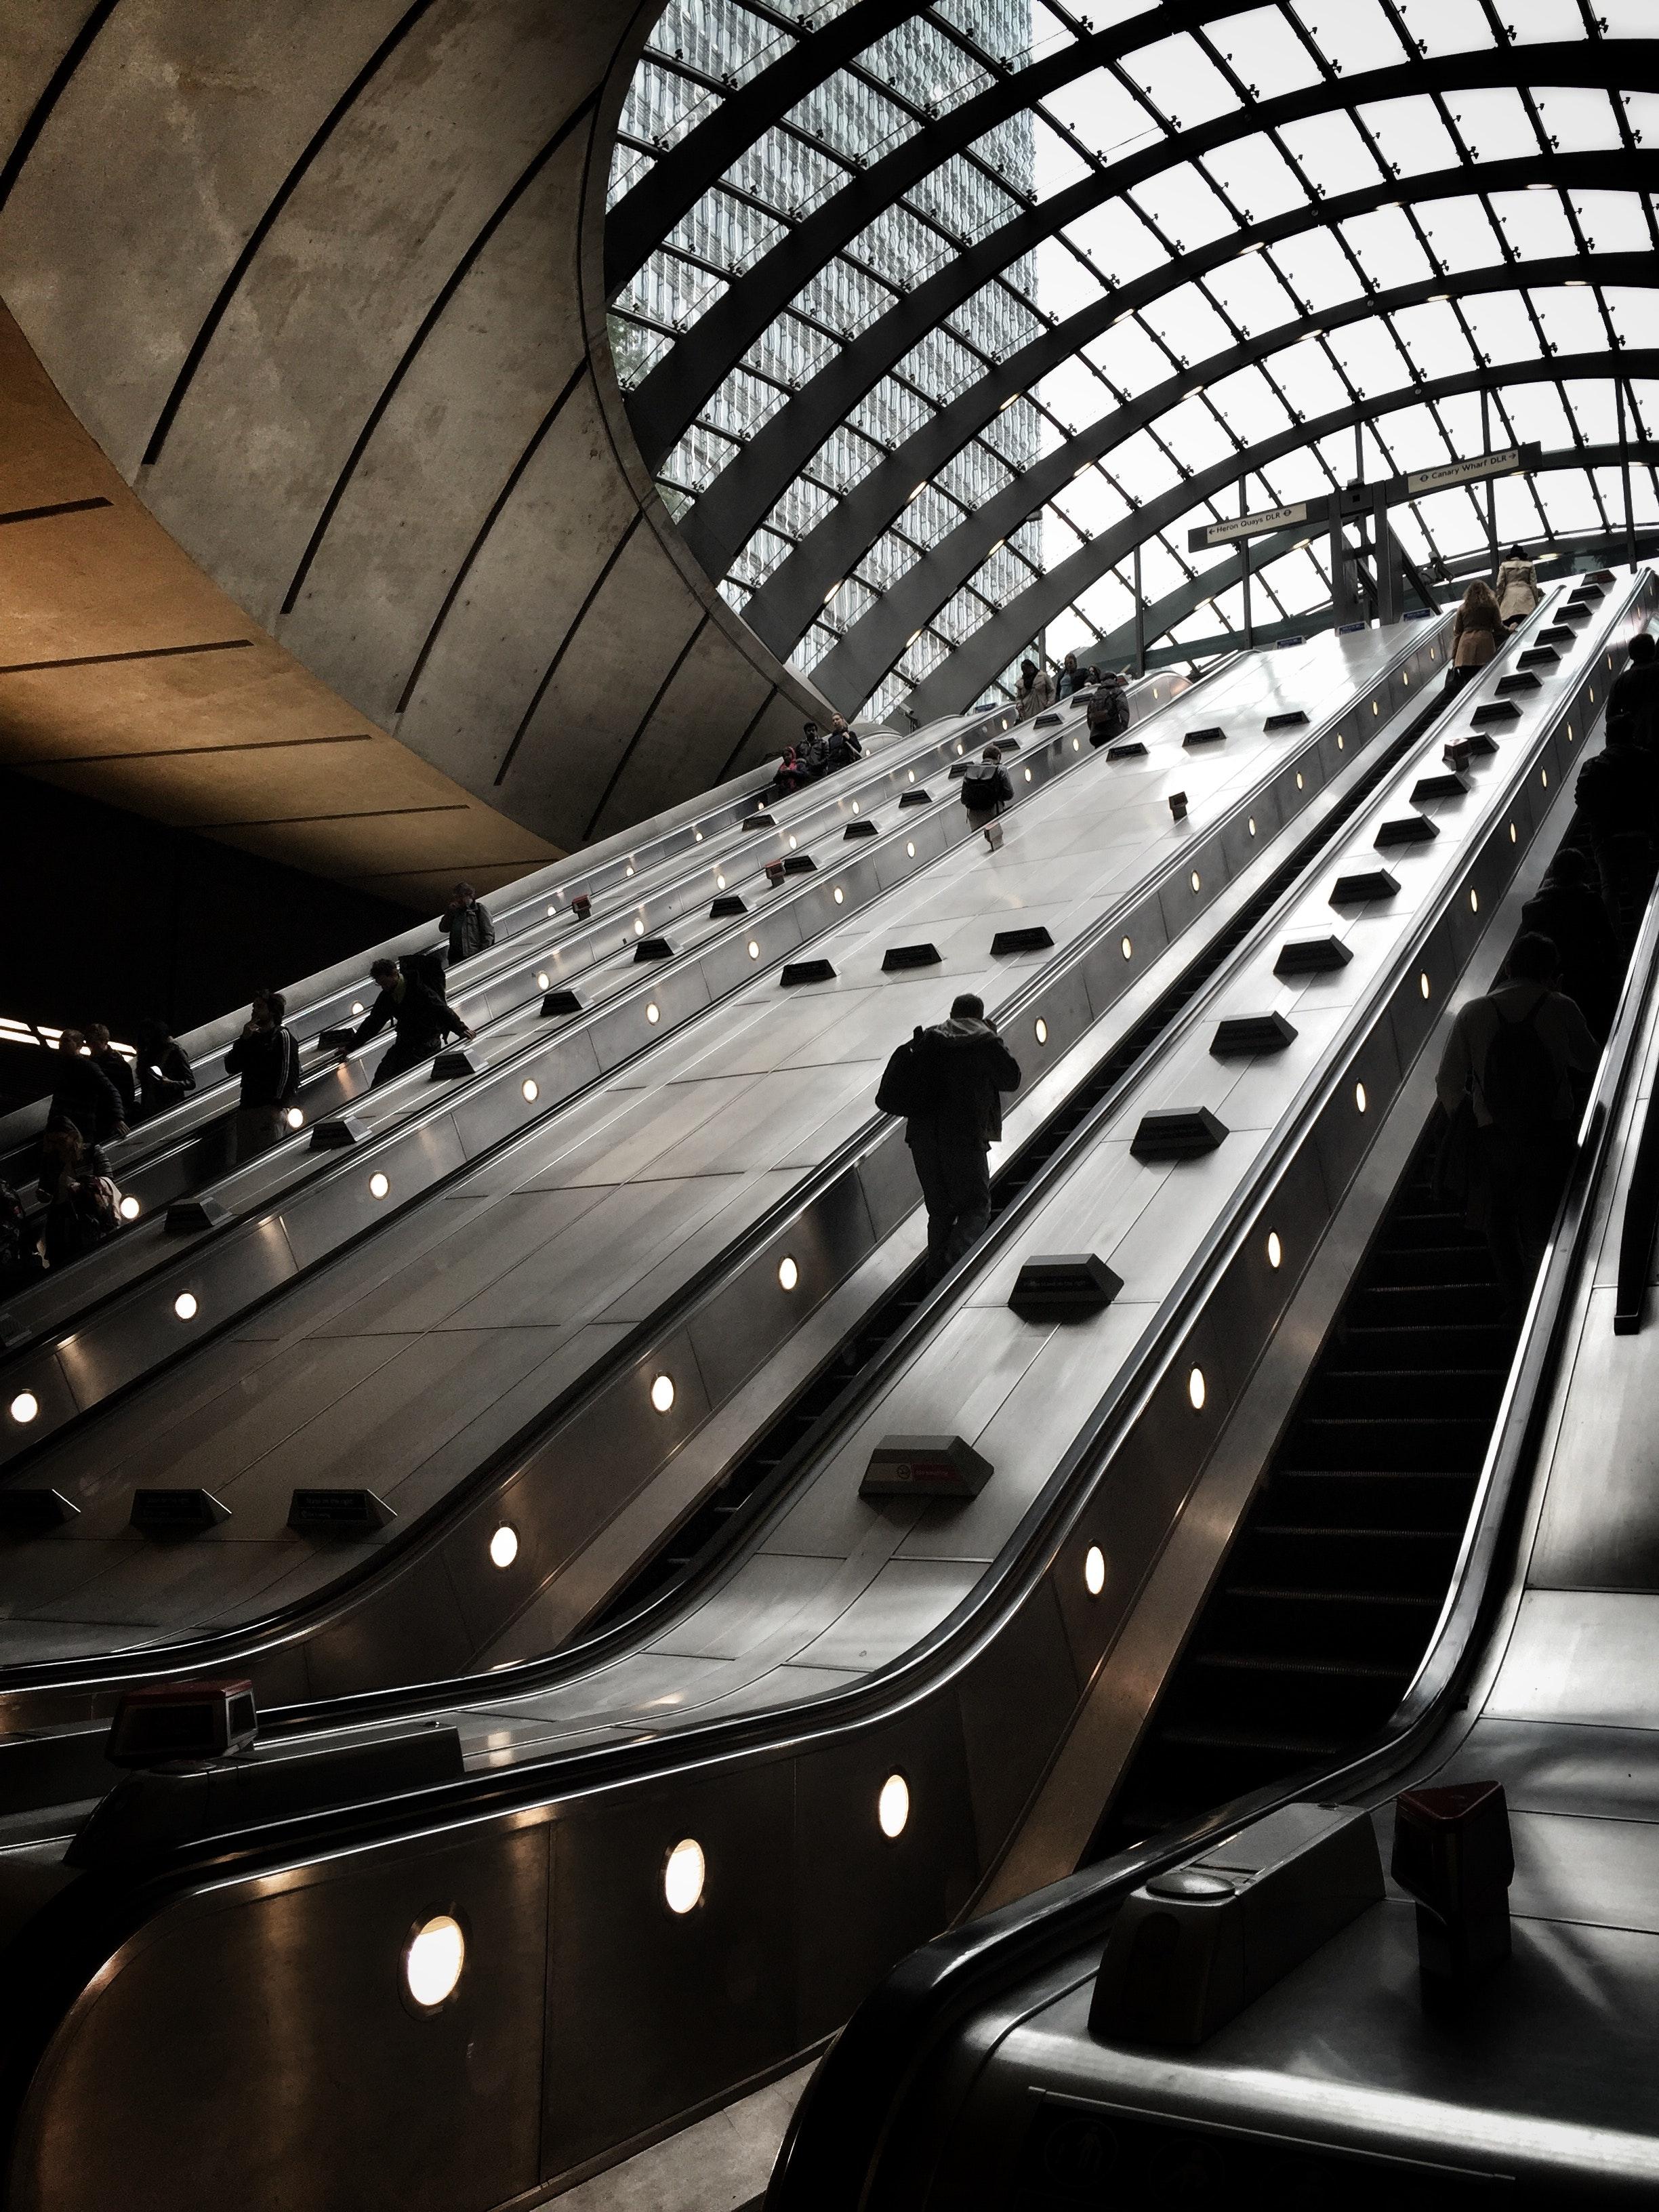 People on an escalator inside a building